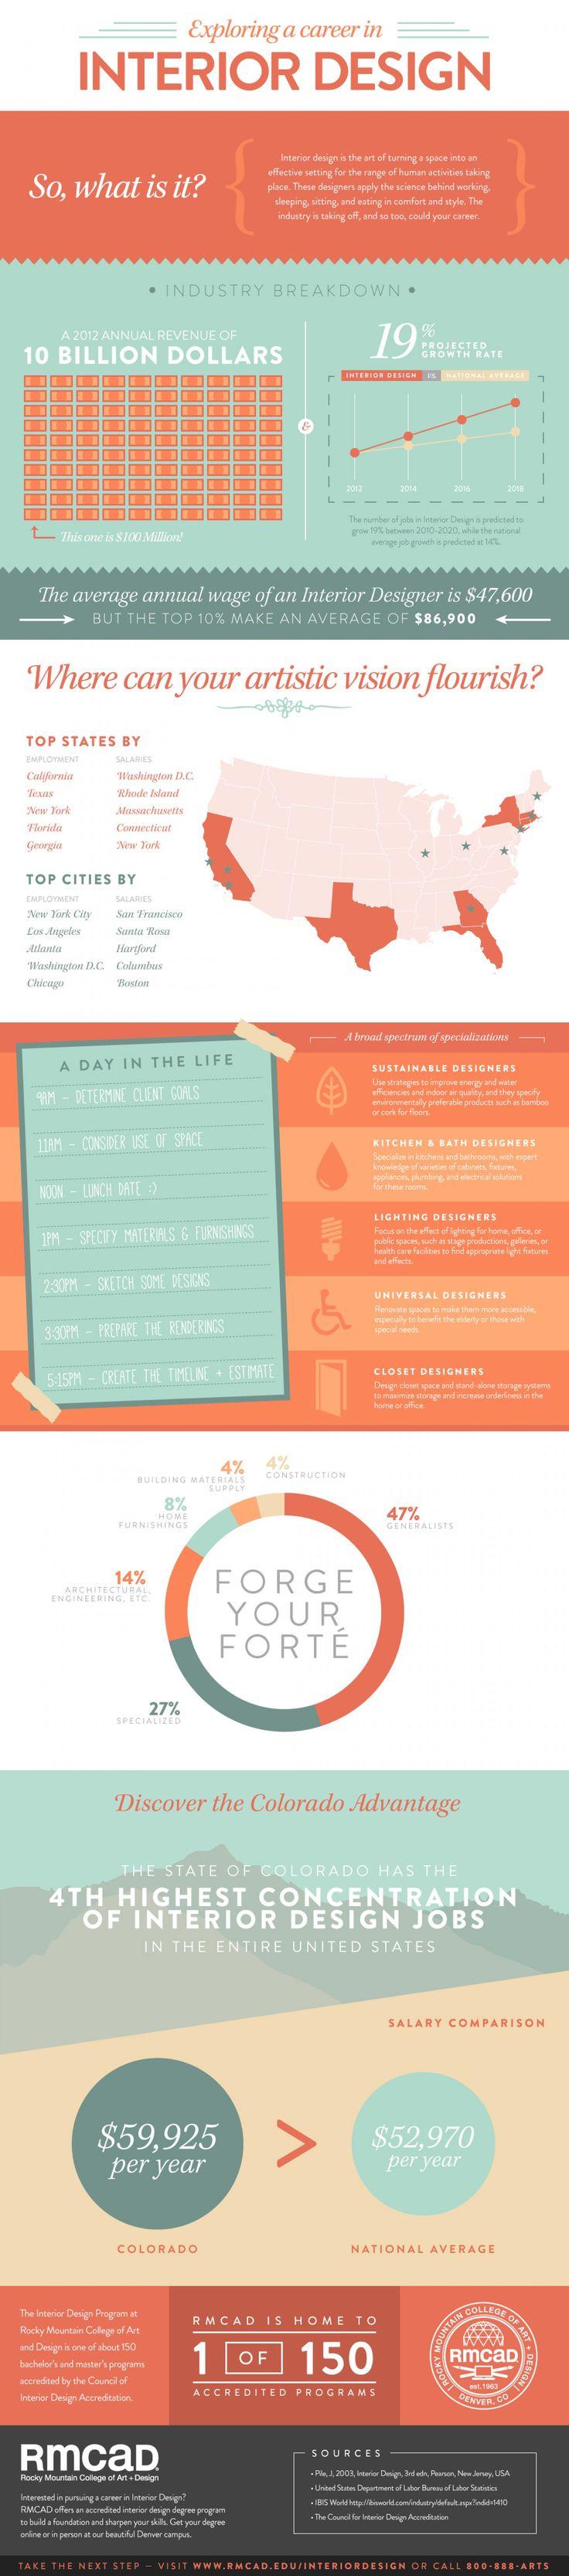 Exploring A Career In Interior Design Infographic